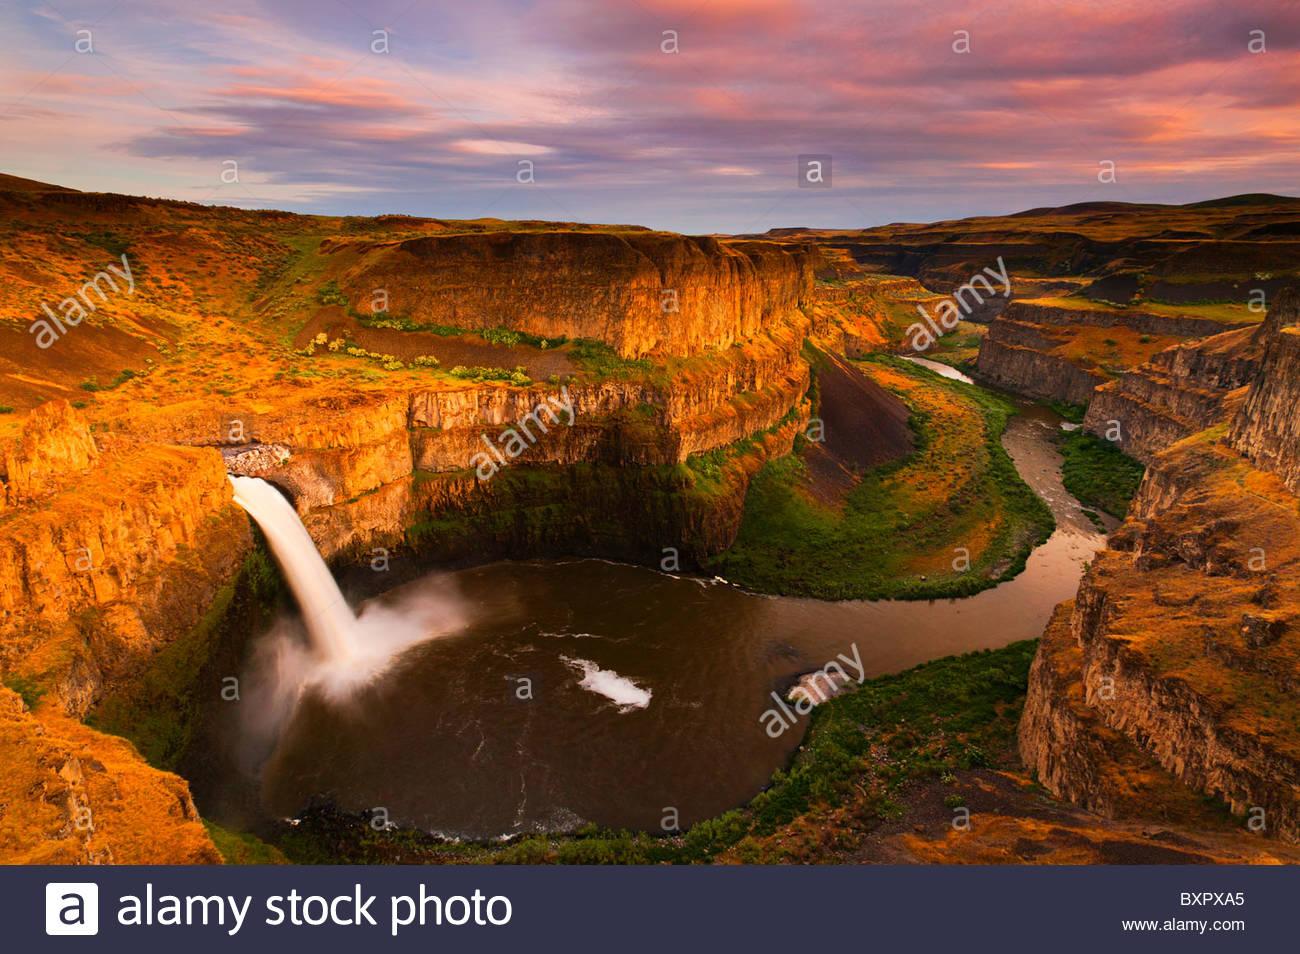 Palouse Falls plunges 180 feet (55 meters) into a giant natural amphitheater near Washtucna, Washington. - Stock Image